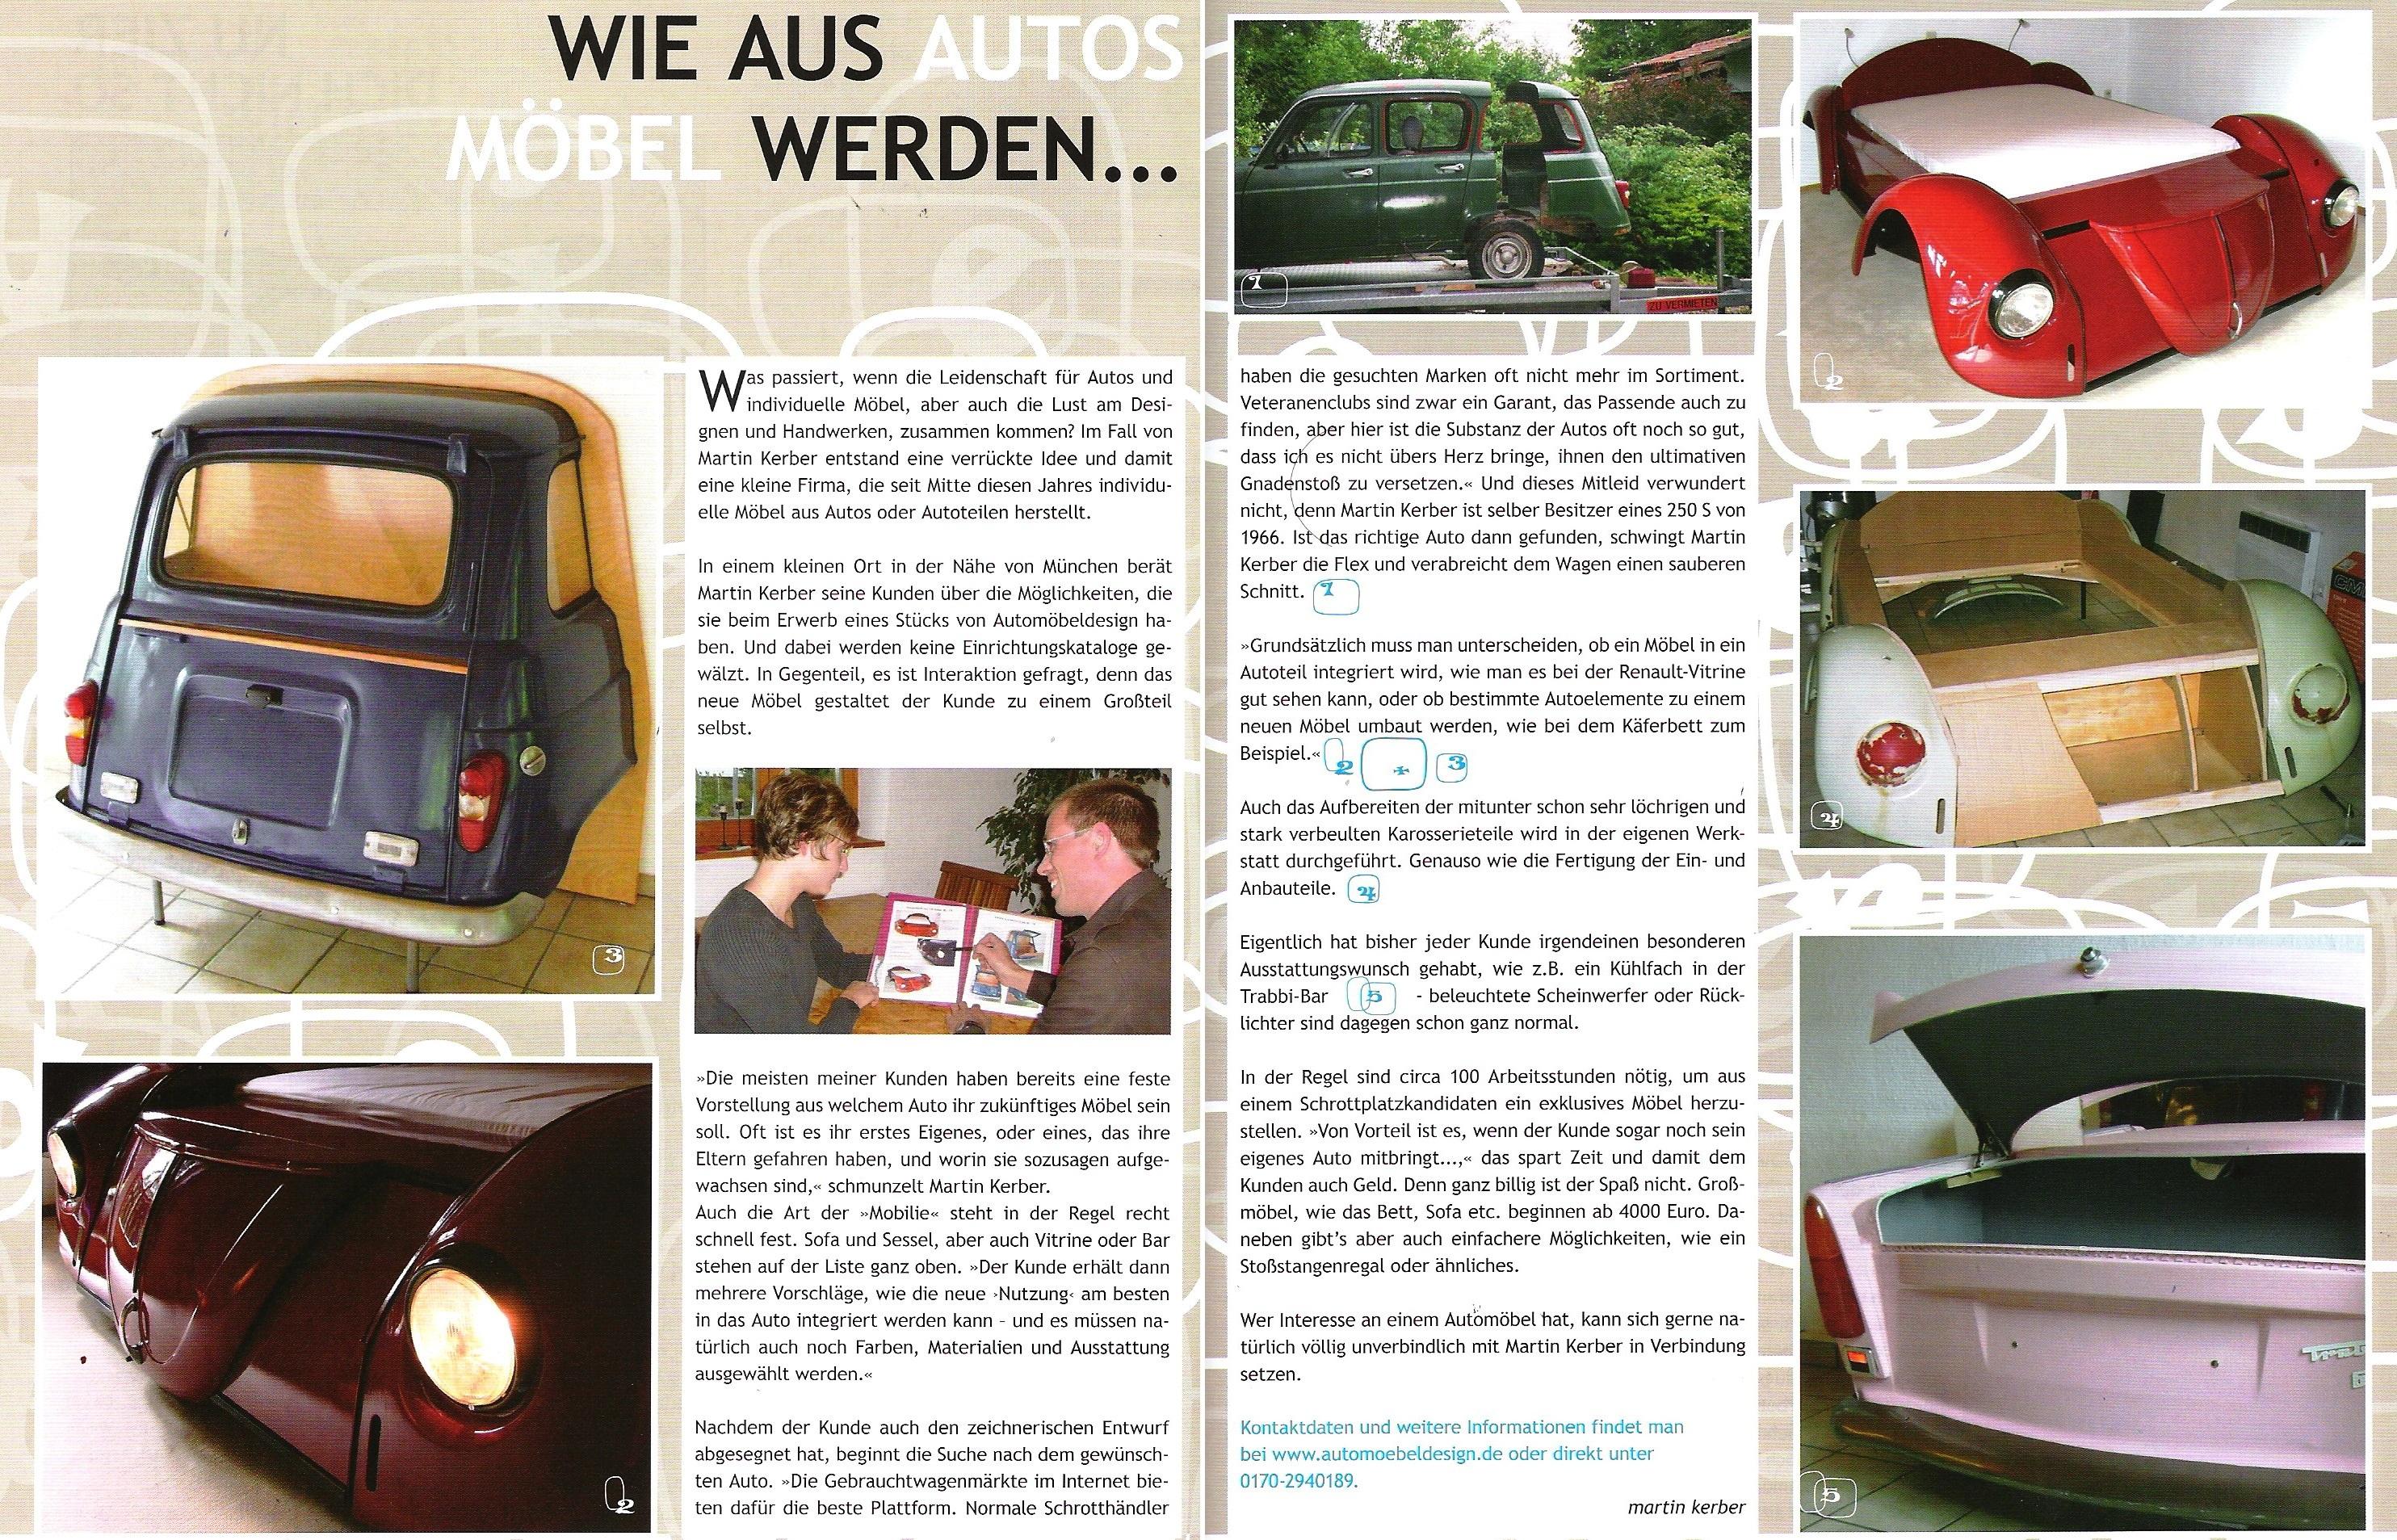 Schön Car Möbel Gebraucht Fotos - Hauptinnenideen - kakados.com